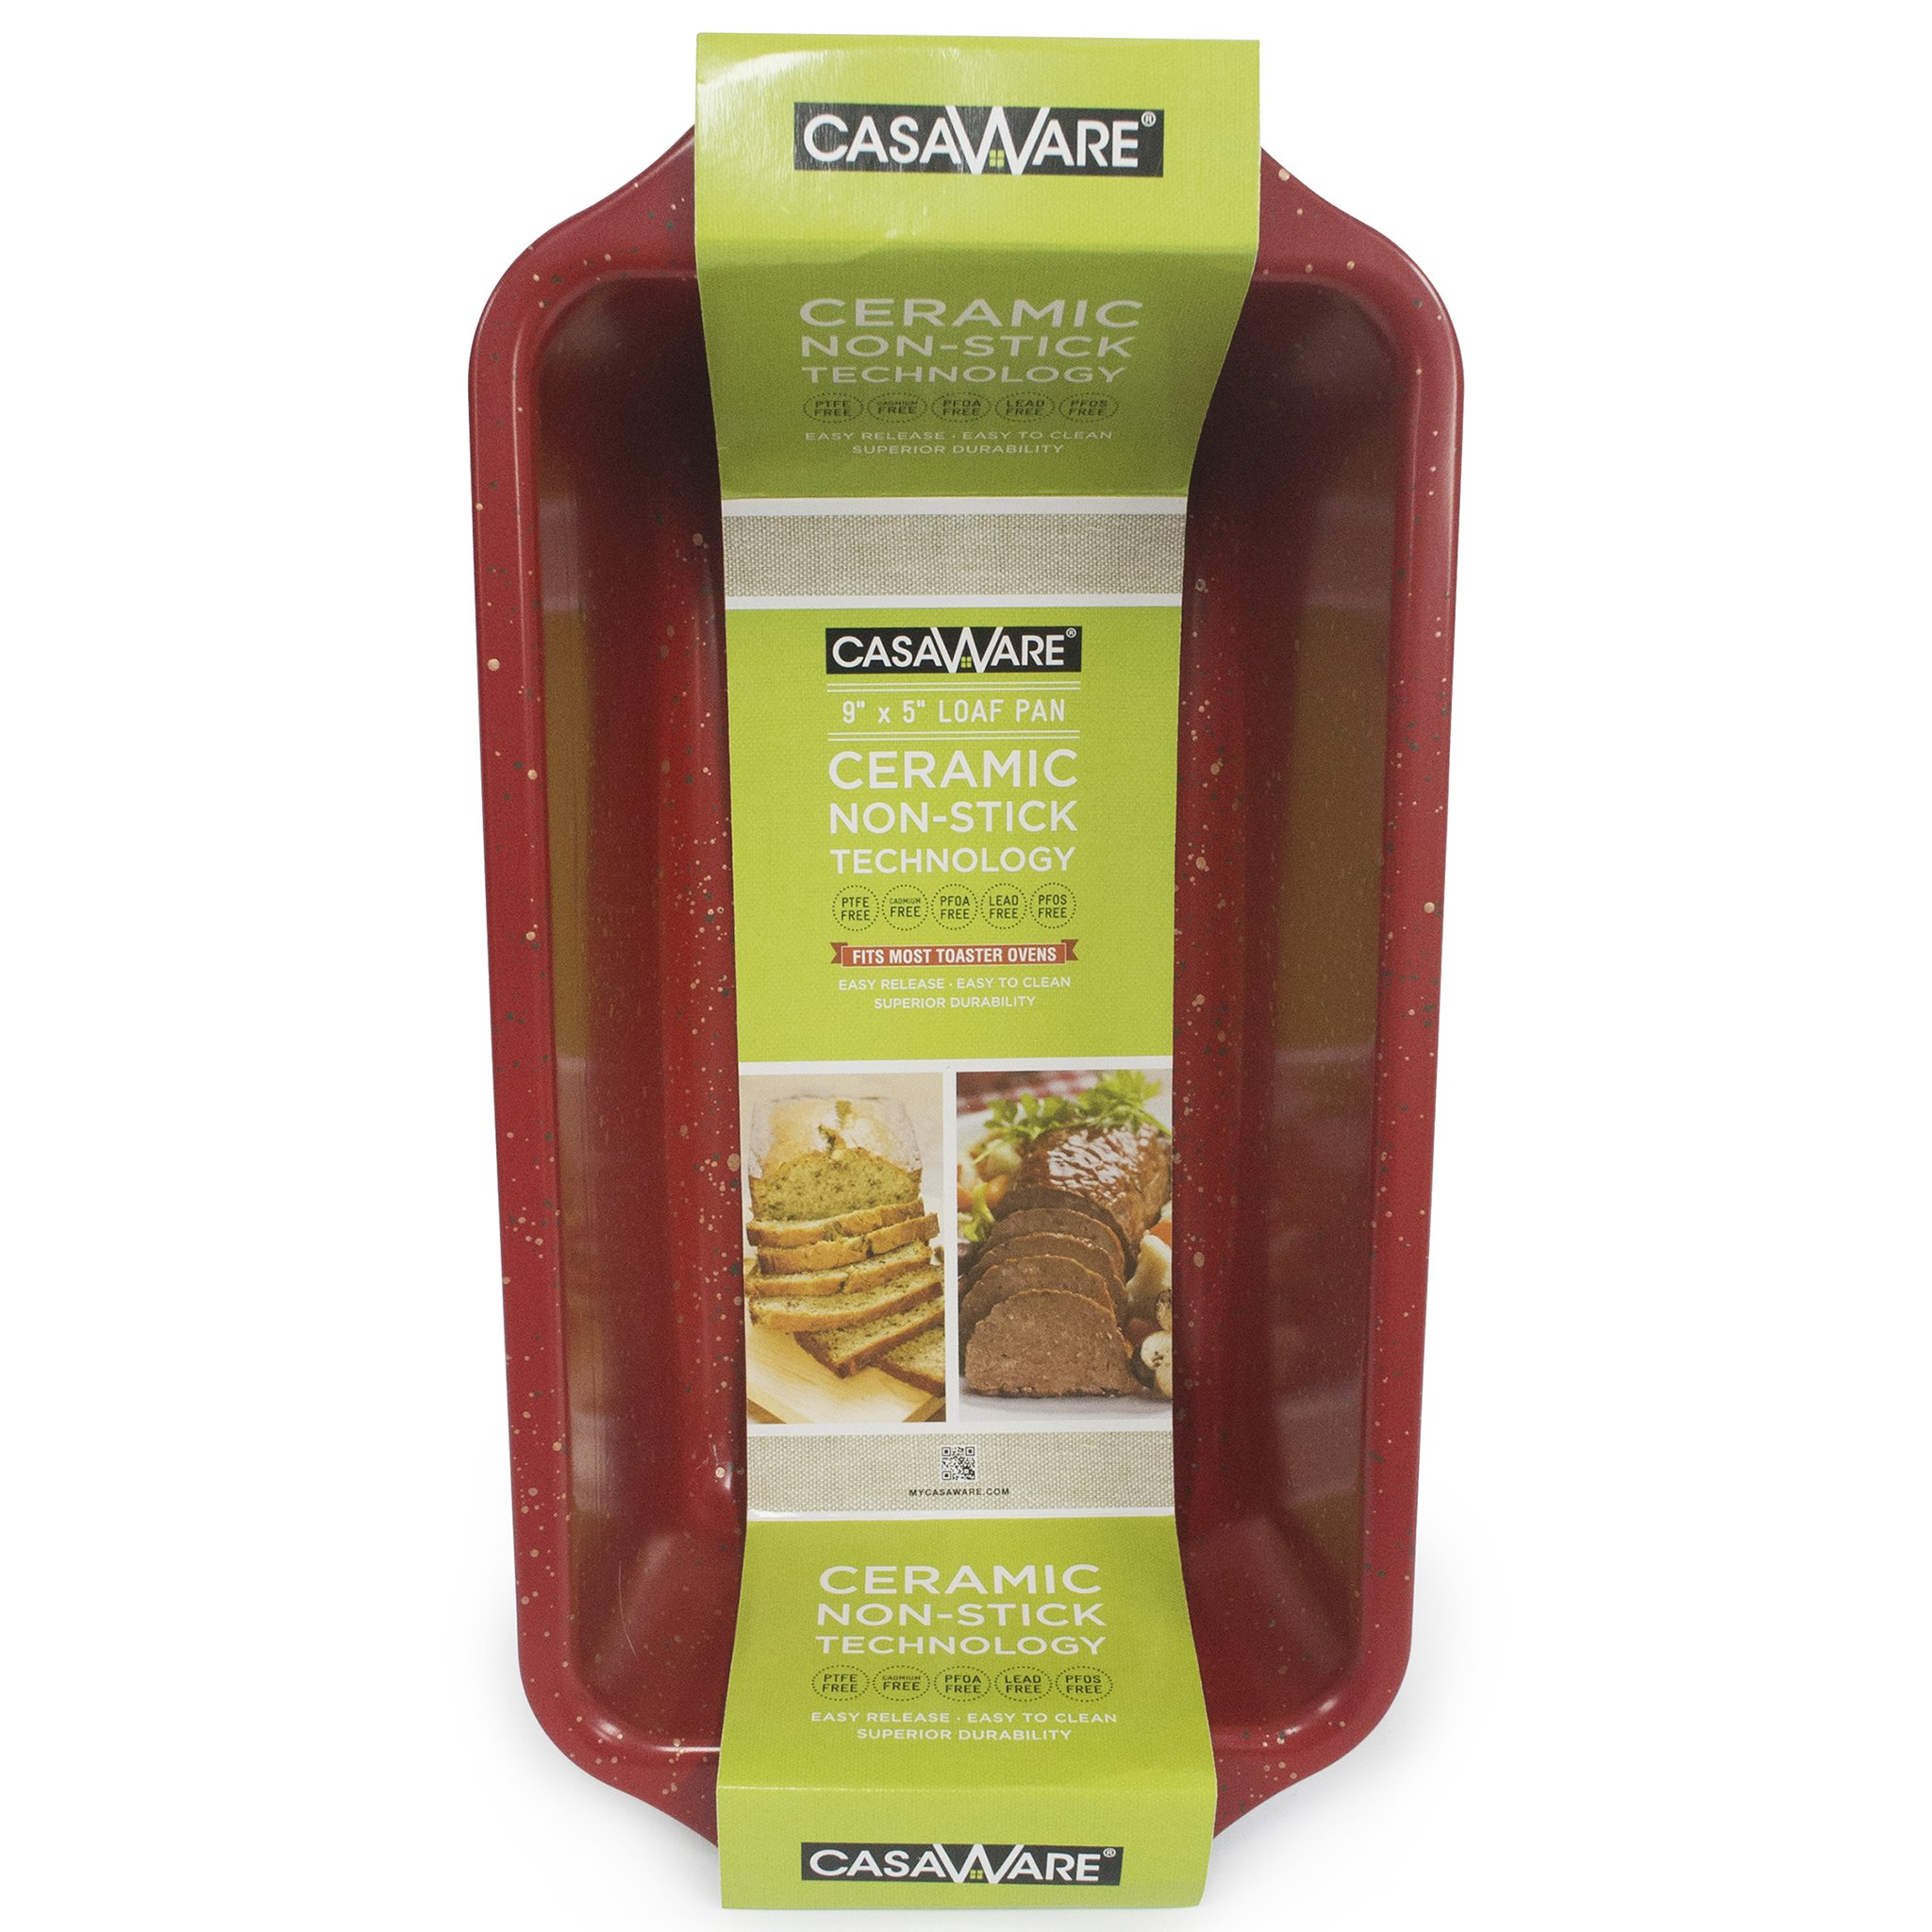 casaWare Loaf Pan 9 x 5-Inch Ceramic Coated Non-Stick (Red Granite)